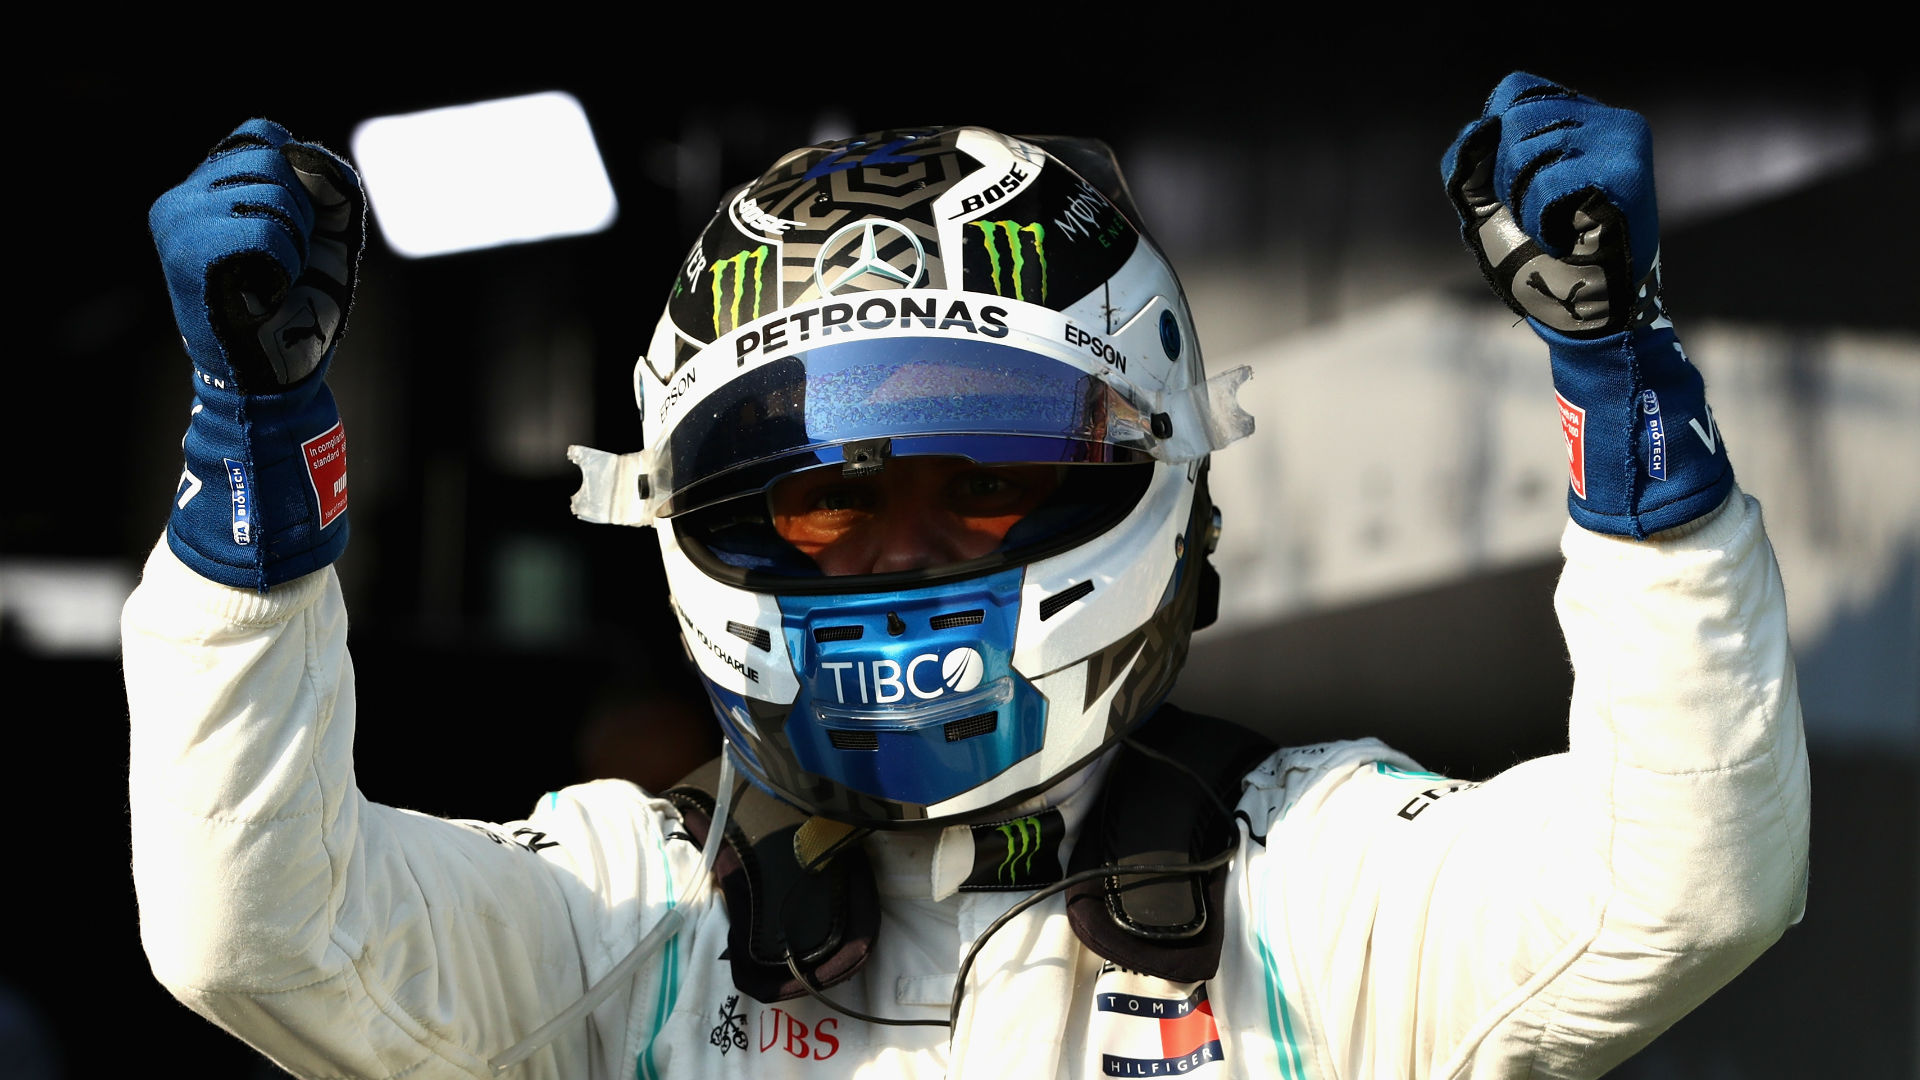 Australian Grand Prix win Bottas' 'best race ever'